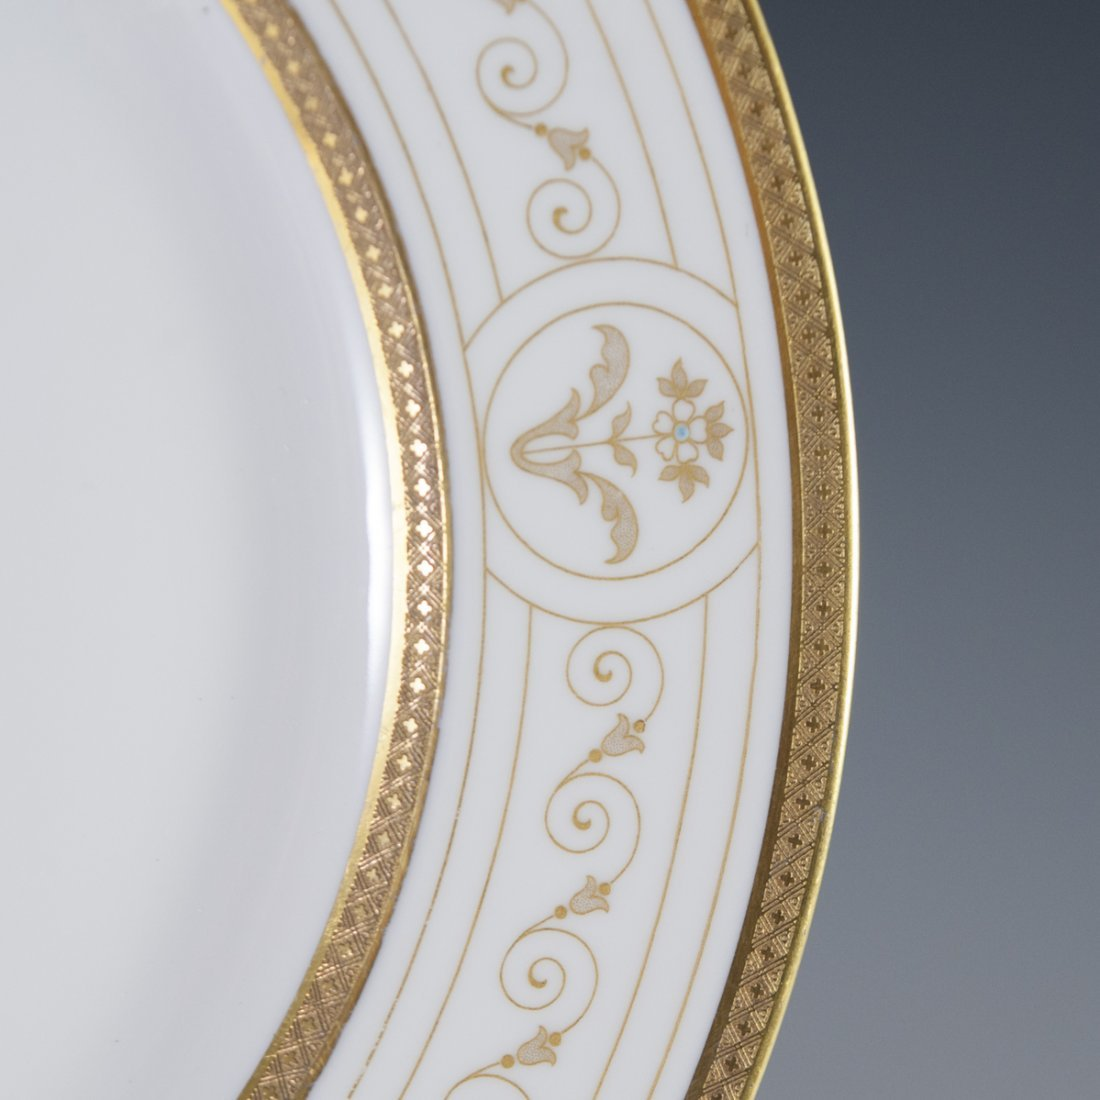 Rosenthal Continental Gilded & Enameled Dinner Plates - 5